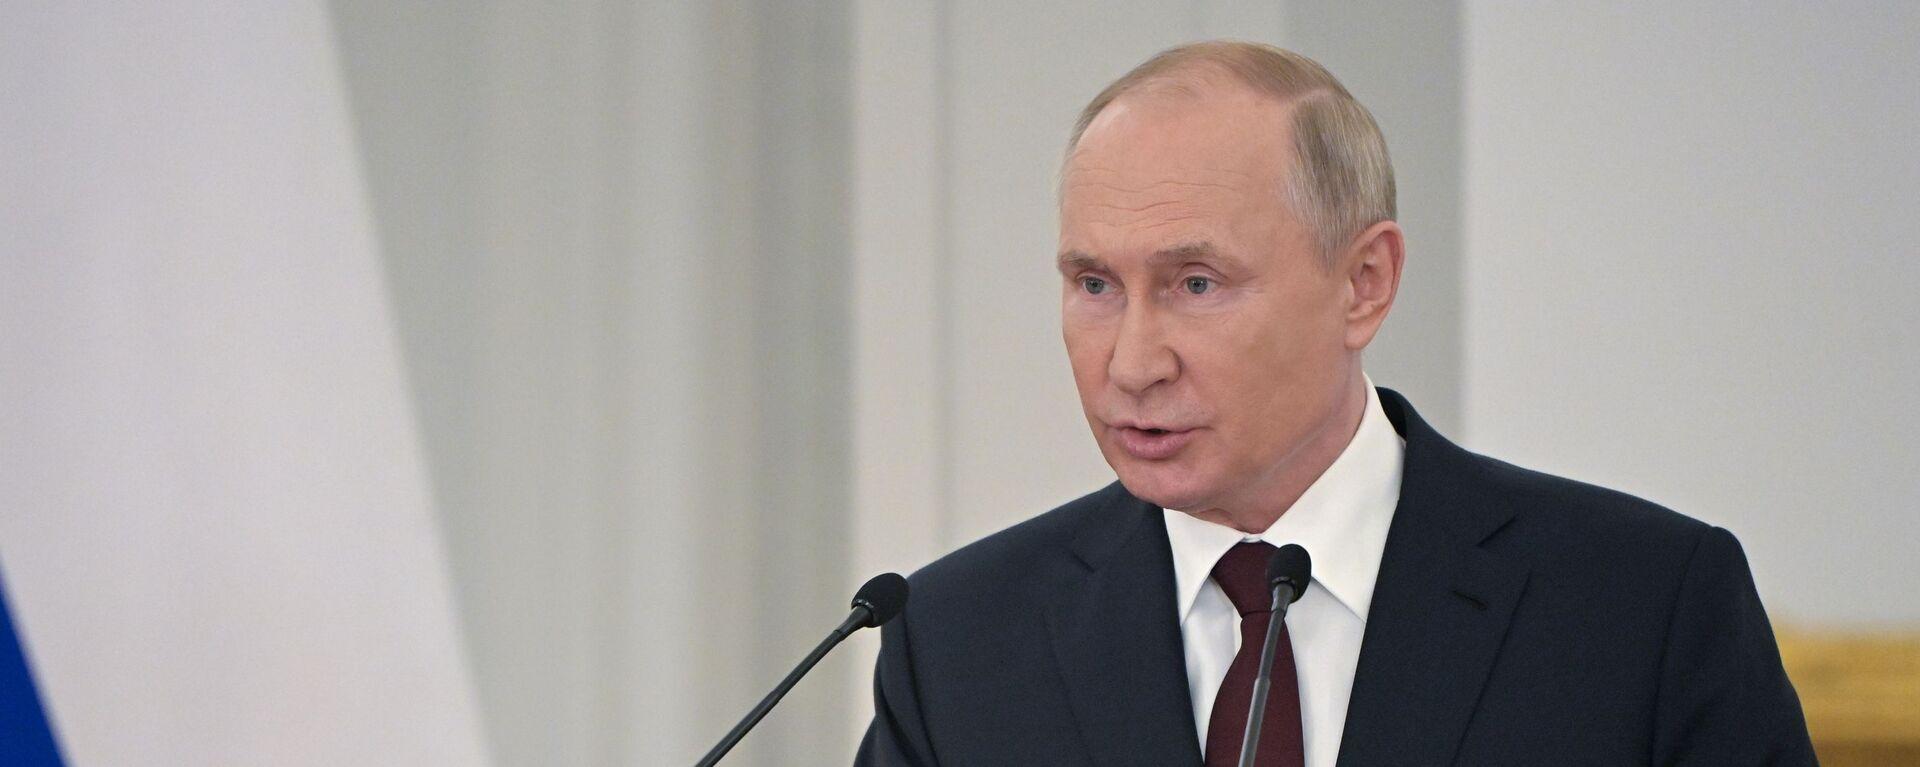 Predsednik Rusije Vladimir Putin - Sputnik Srbija, 1920, 13.07.2021